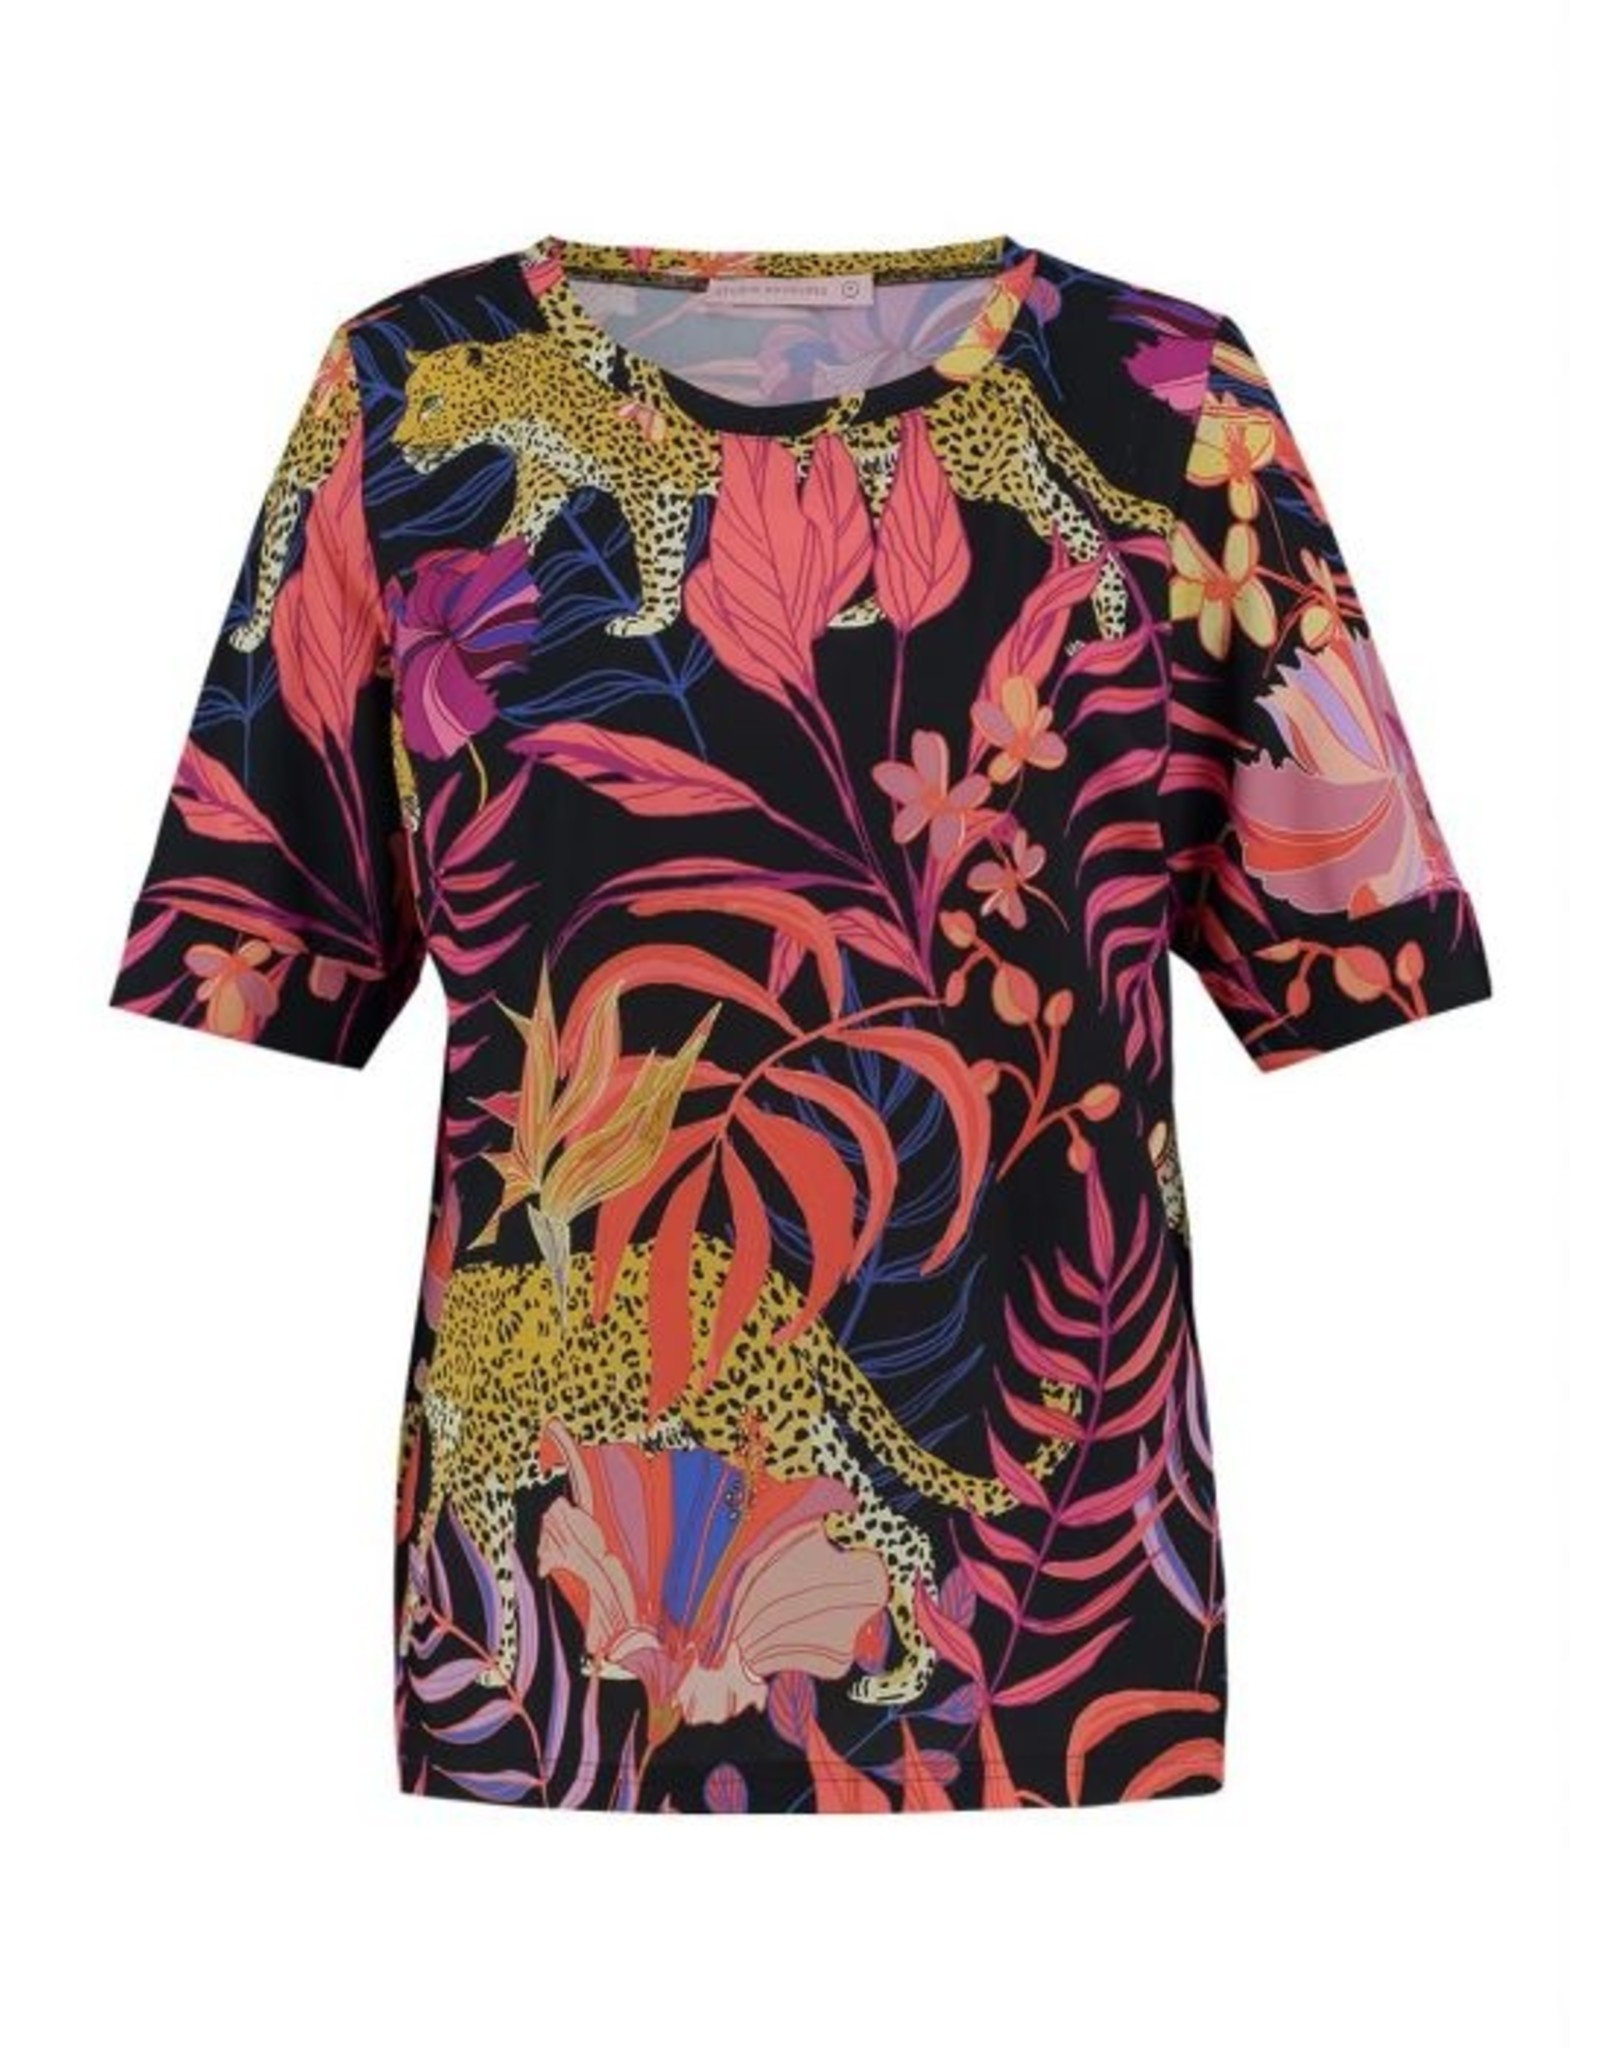 Studio Anneloes Wicky shirt